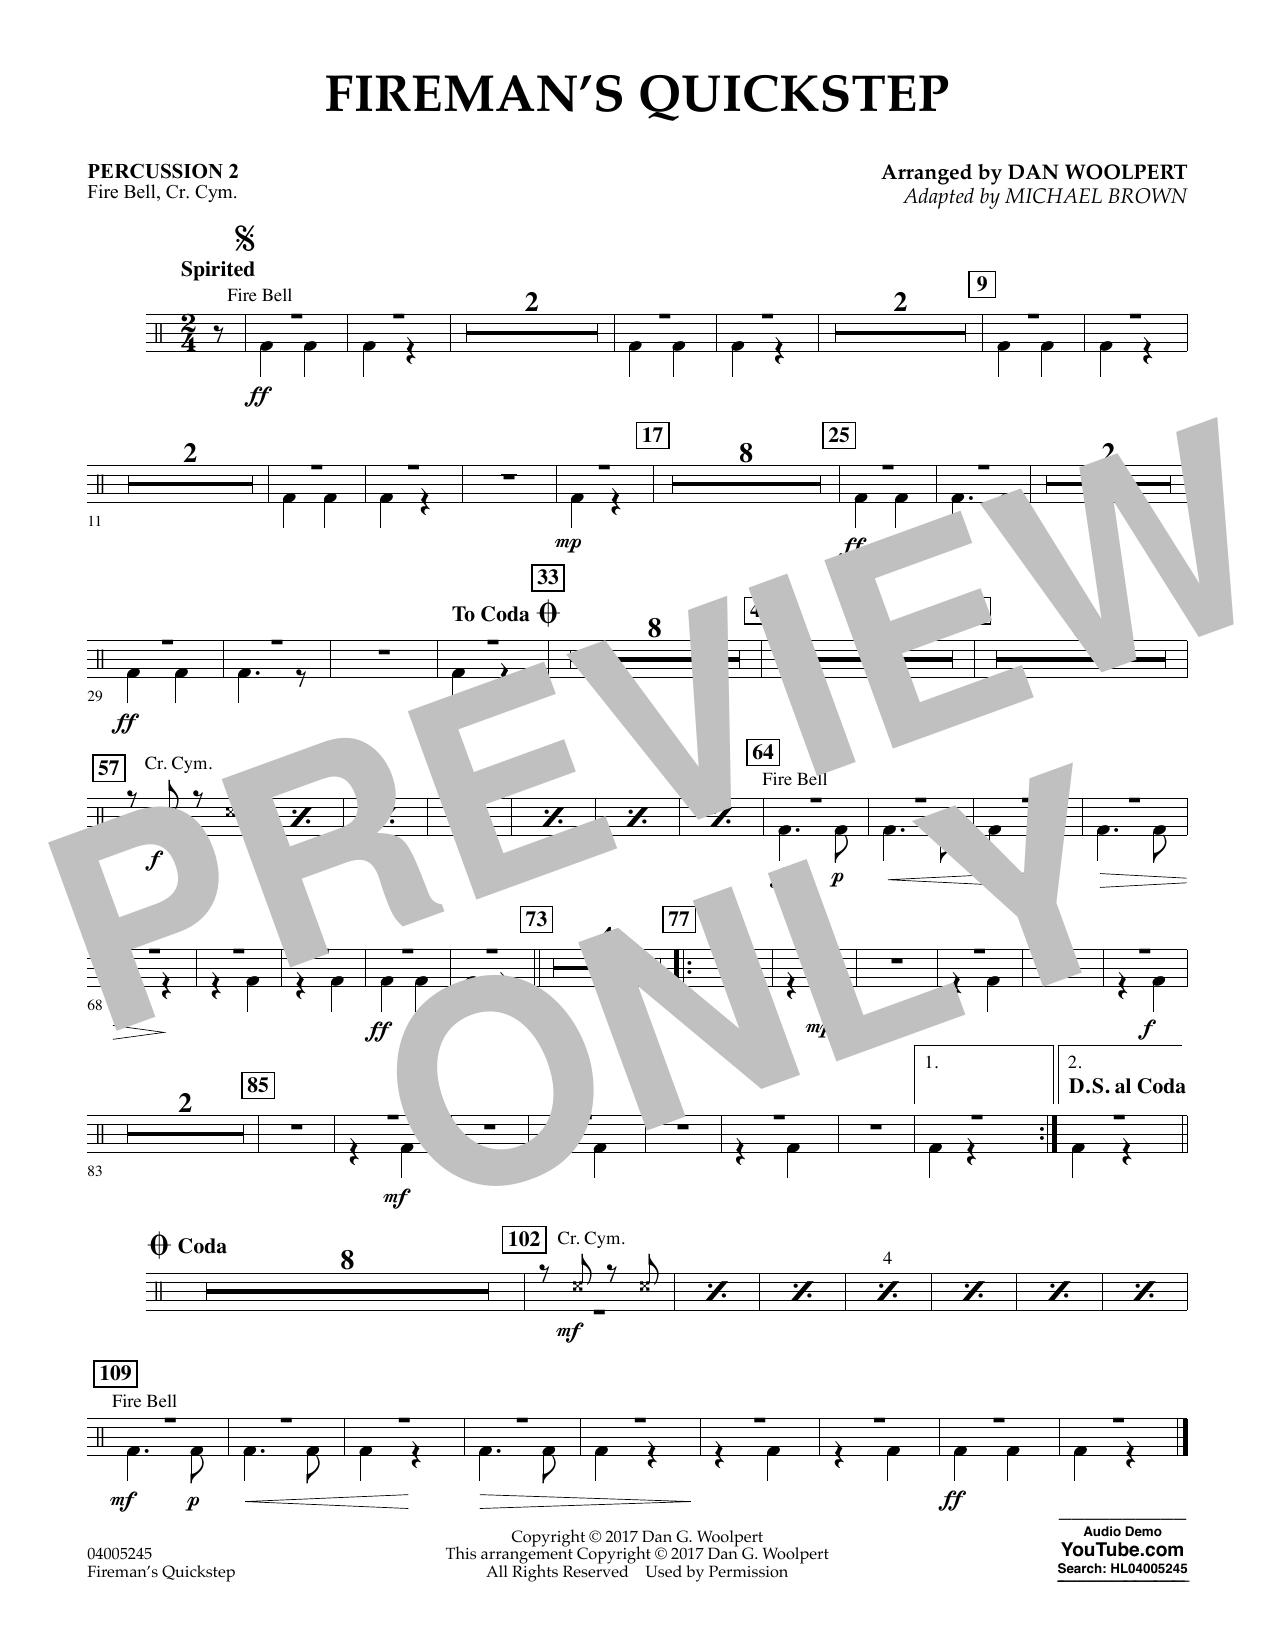 Fireman's Quickstep - Percussion 2 (Concert Band)